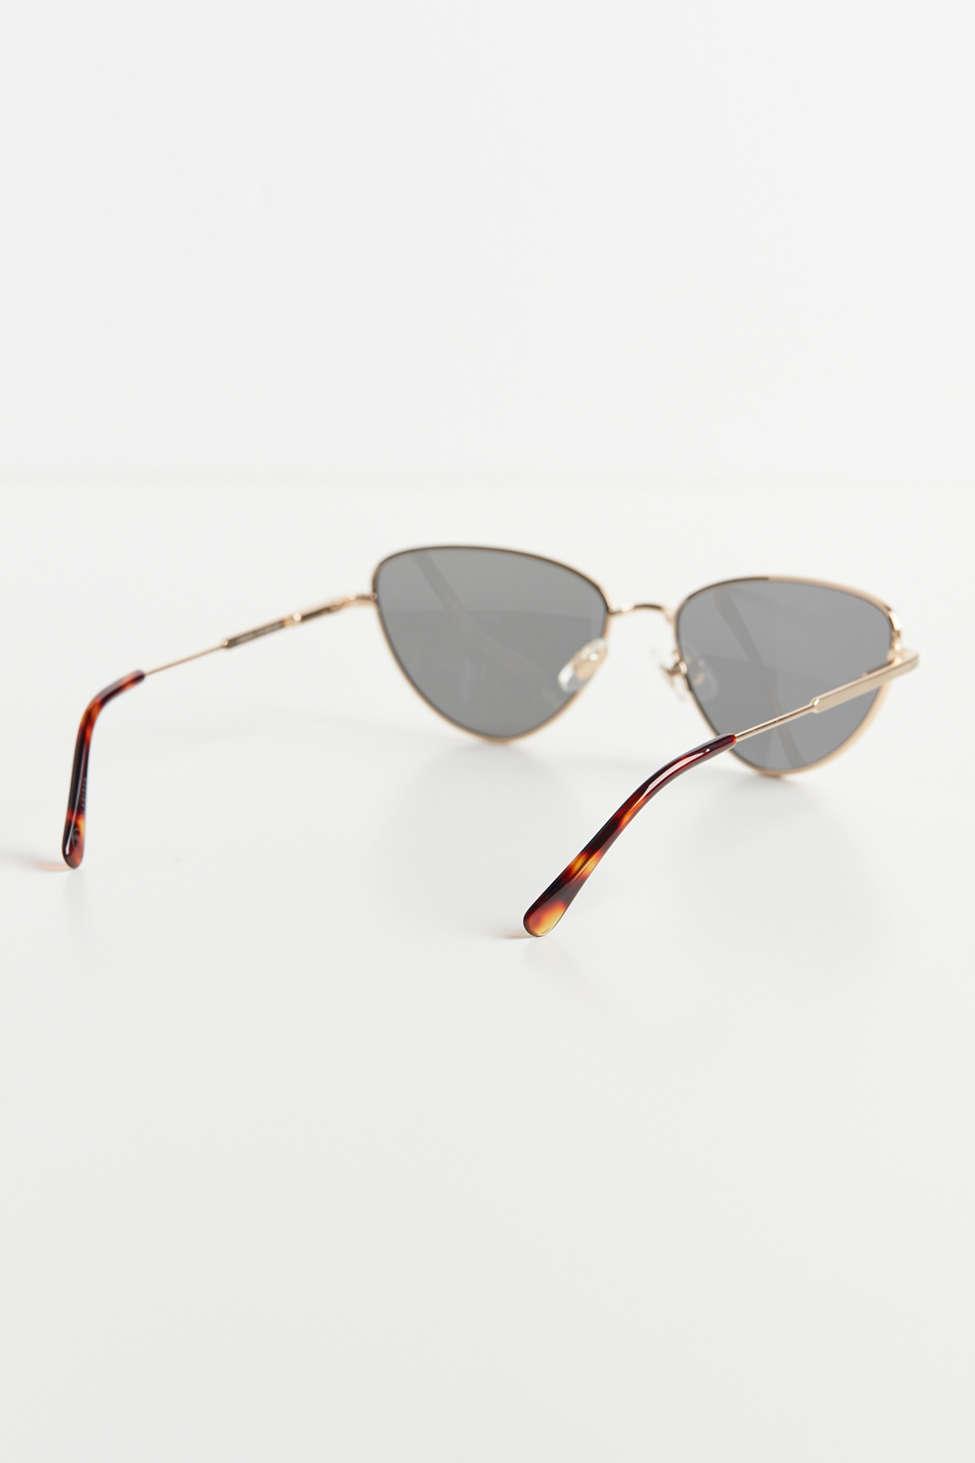 Crap Eyewear The Honey Buzz Sunglasses by Crap Eyewear